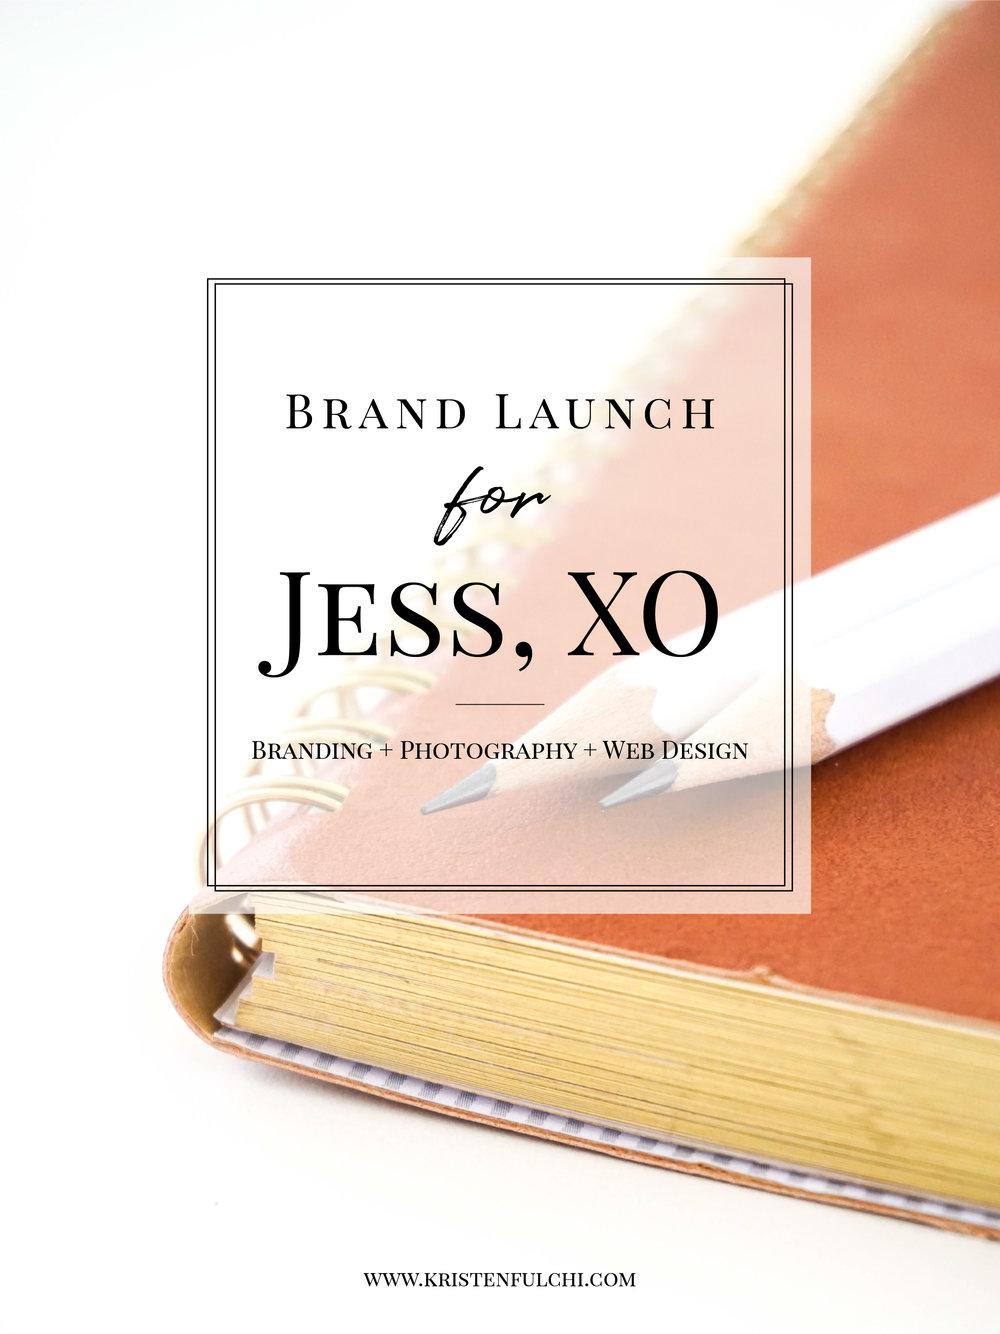 kristen-fulchi-design-studio-branding-photography-web-design-for-creatives-small-businesses-miami-florida-brand-project-jess-xo1.jpg